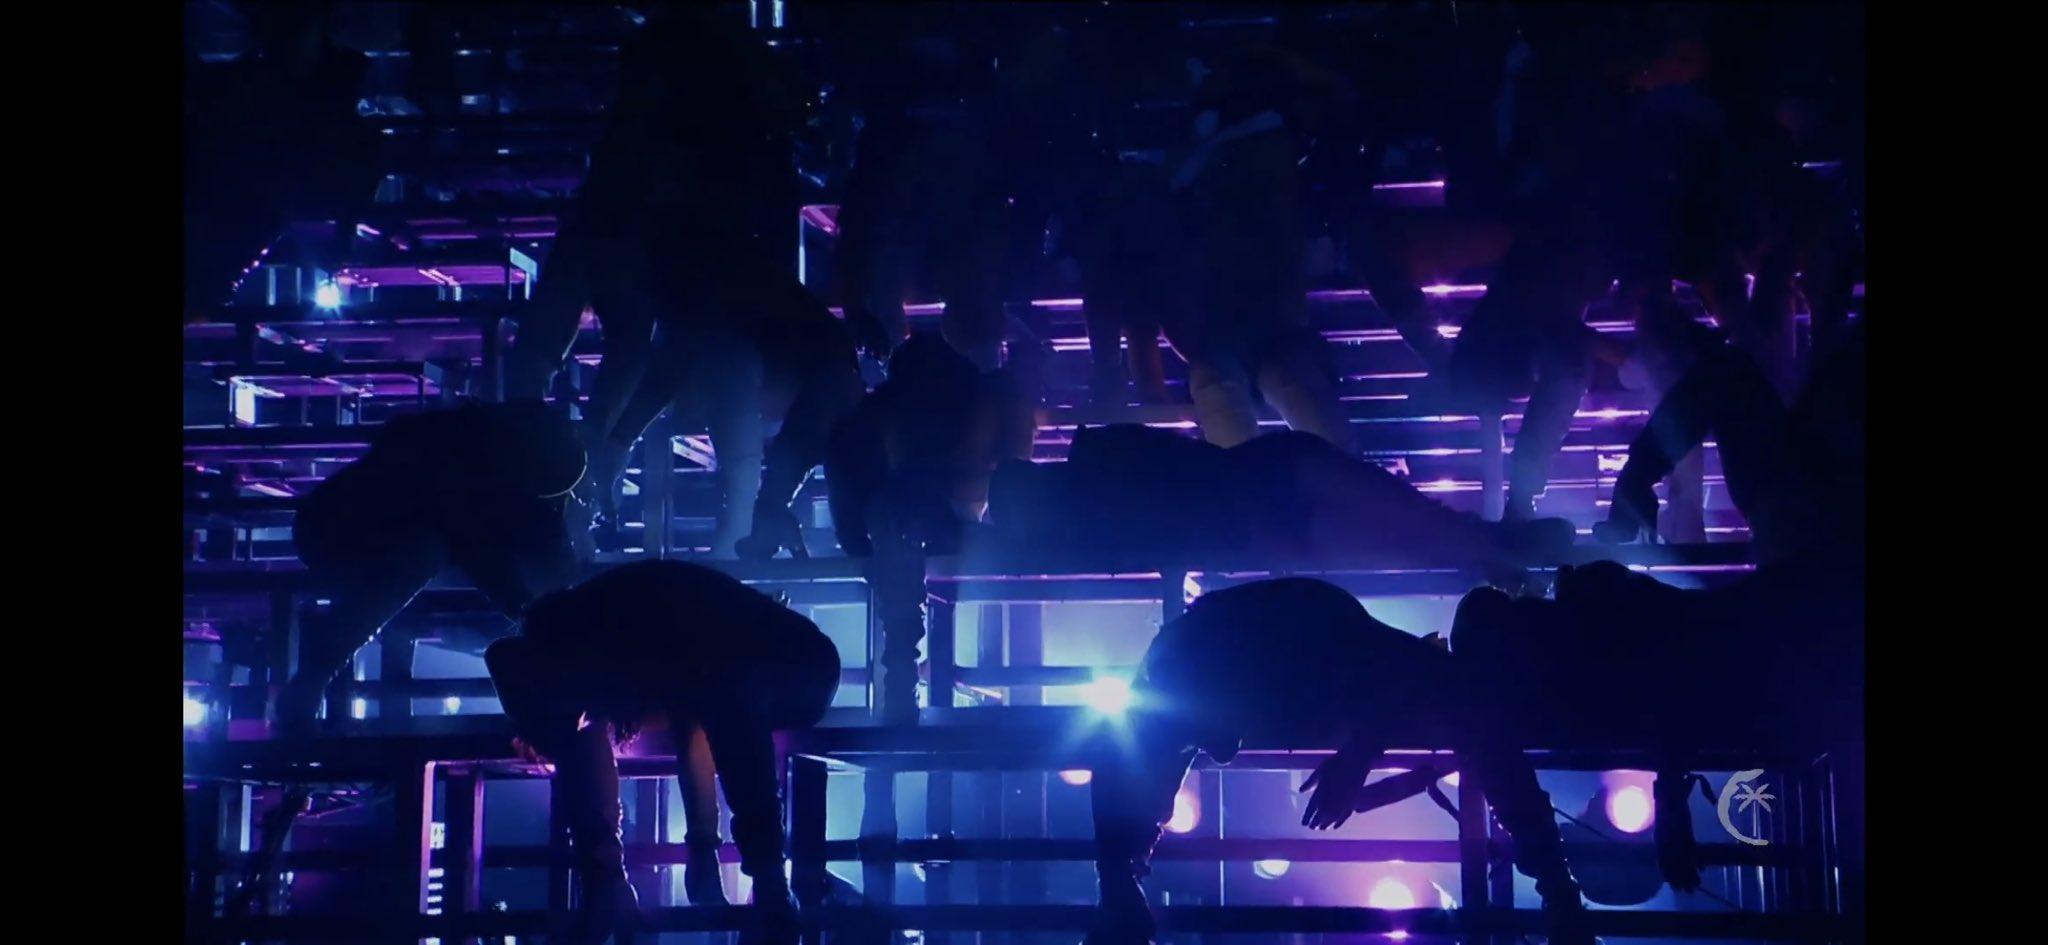 We Be All Night! #Beychella #Coachella2018 https://t.co/Z9TVH0s0kB